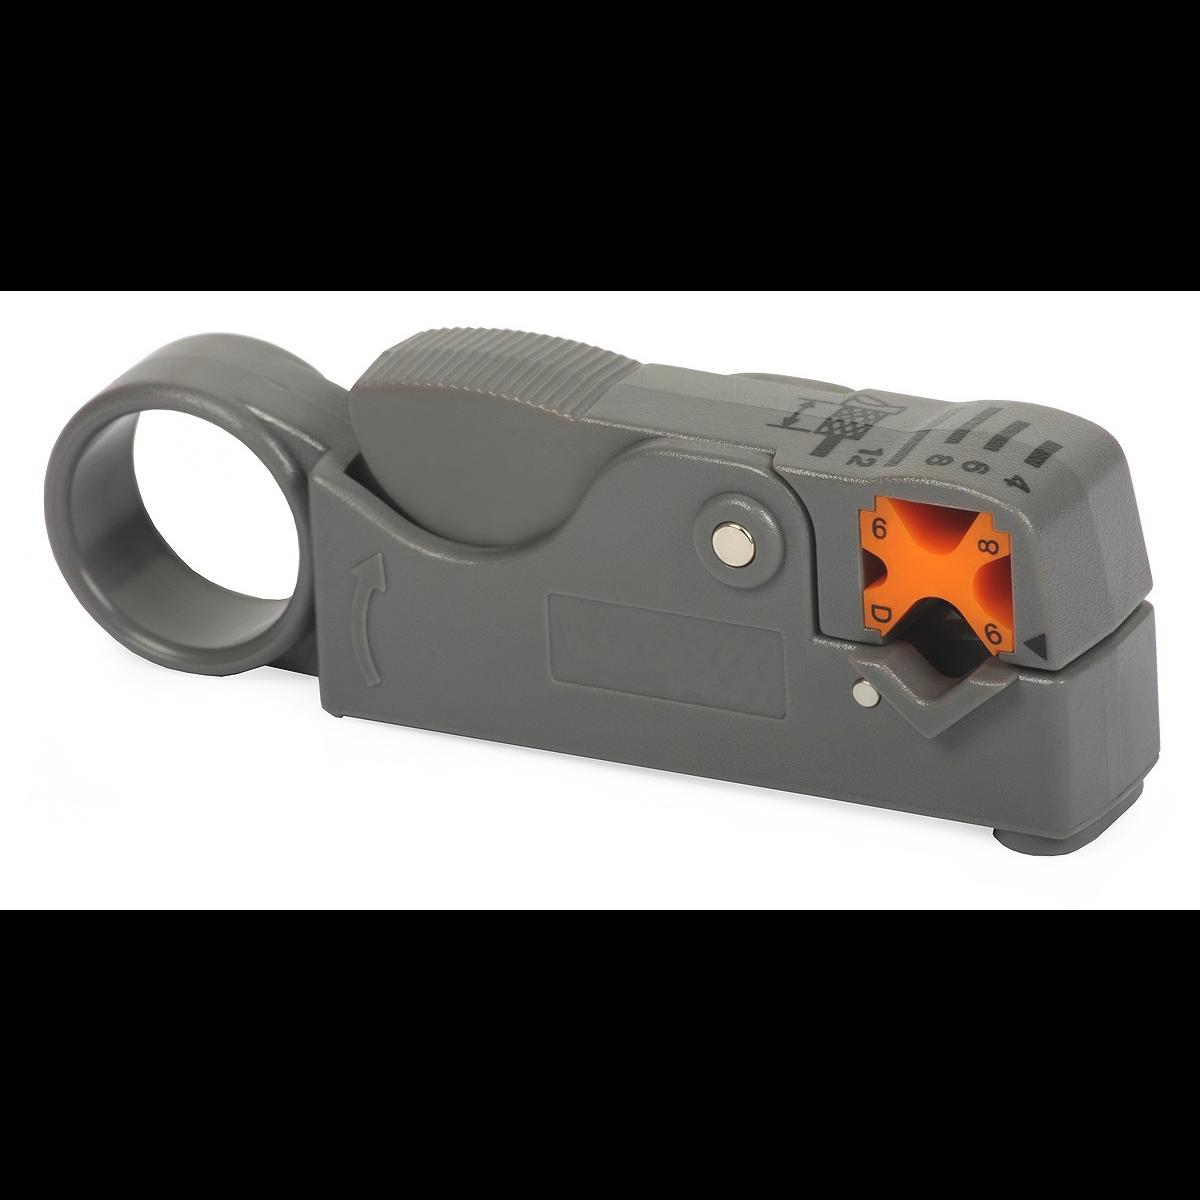 Стриппер для коаксиального кабеля (RG-58/59/62/6), 2 лезвия SNR-HT-332